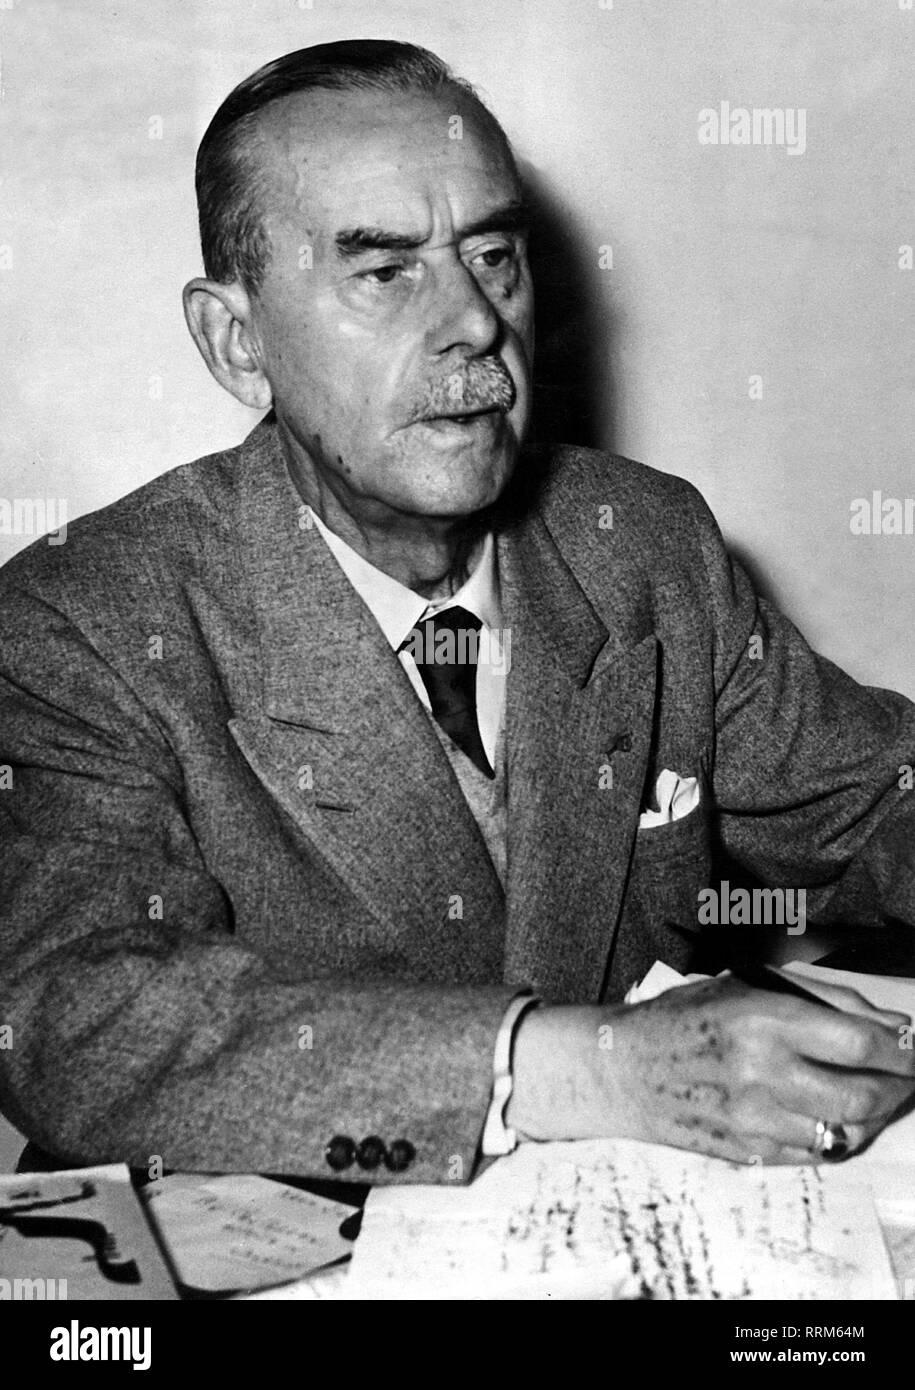 Mann, Thomas, 6.6.1875 - 12.8.1955, deutscher Autor/Schriftsteller, Nobelpreisträger für Literatur 1929, halbe Länge, 40s, 40s, Additional-Rights - Clearance-Info - Not-Available Stockbild